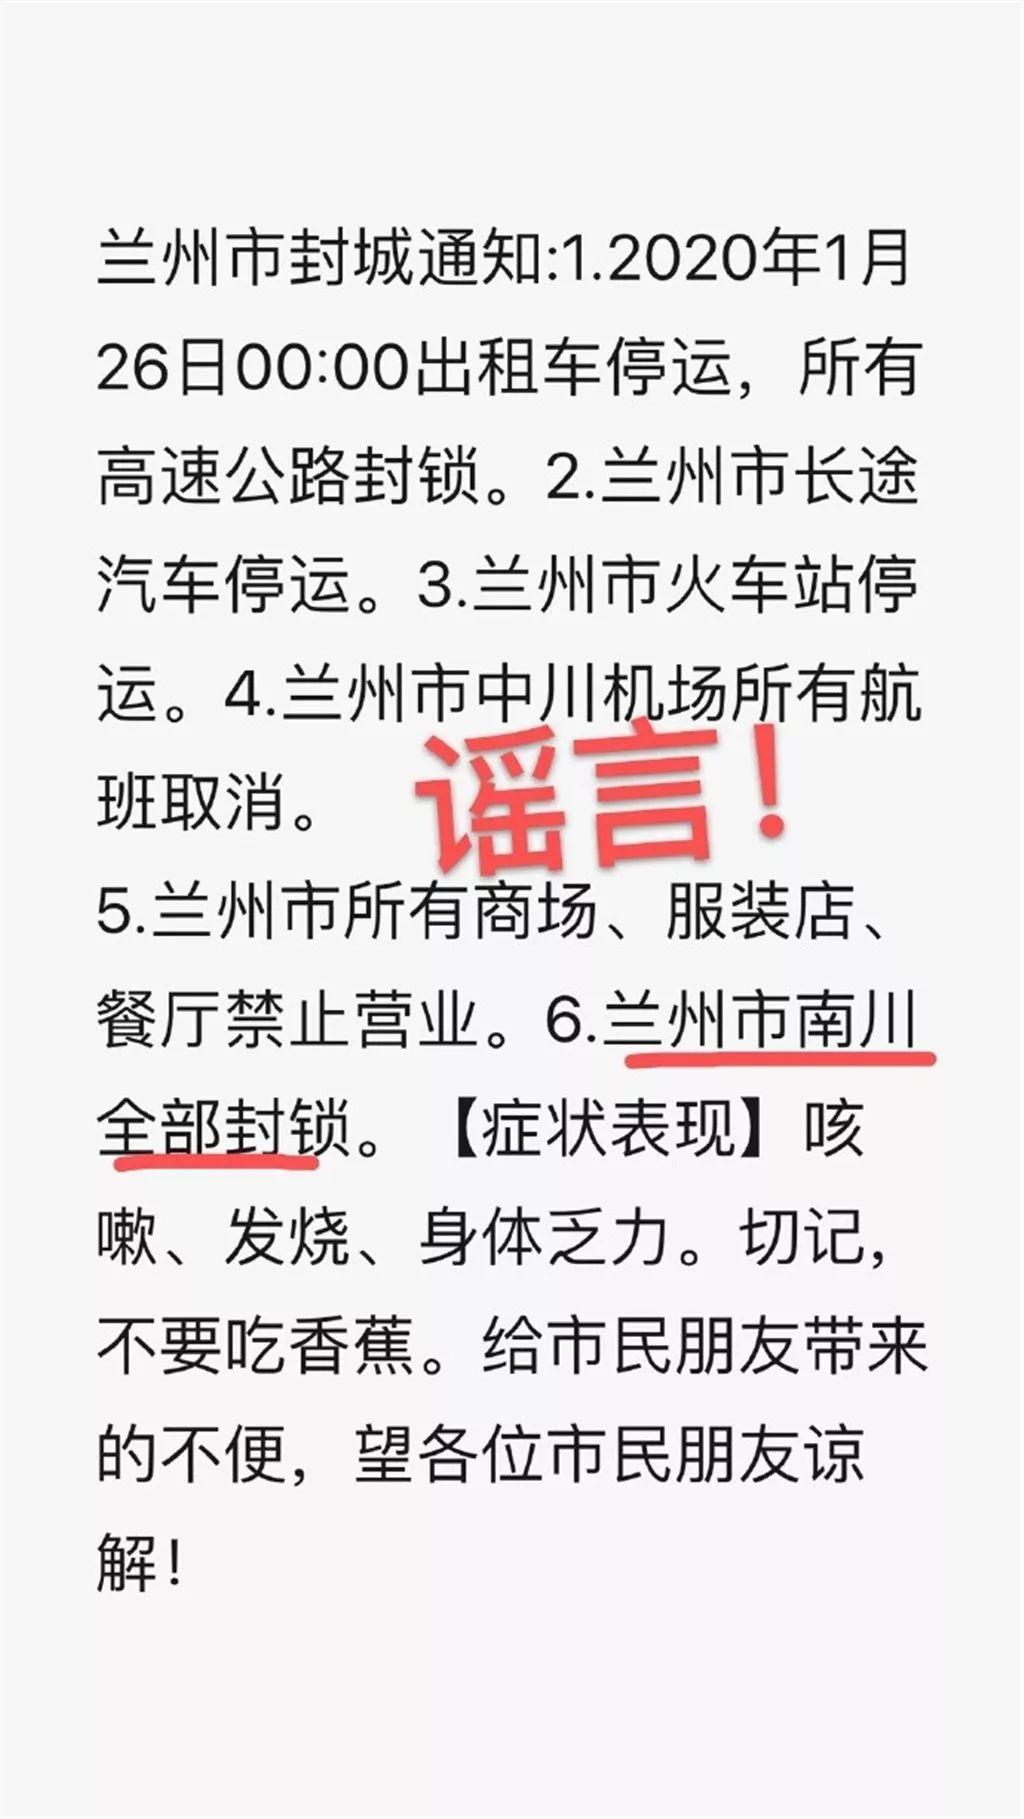 http://www.lzhmzz.com/lanzhoujingji/67588.html